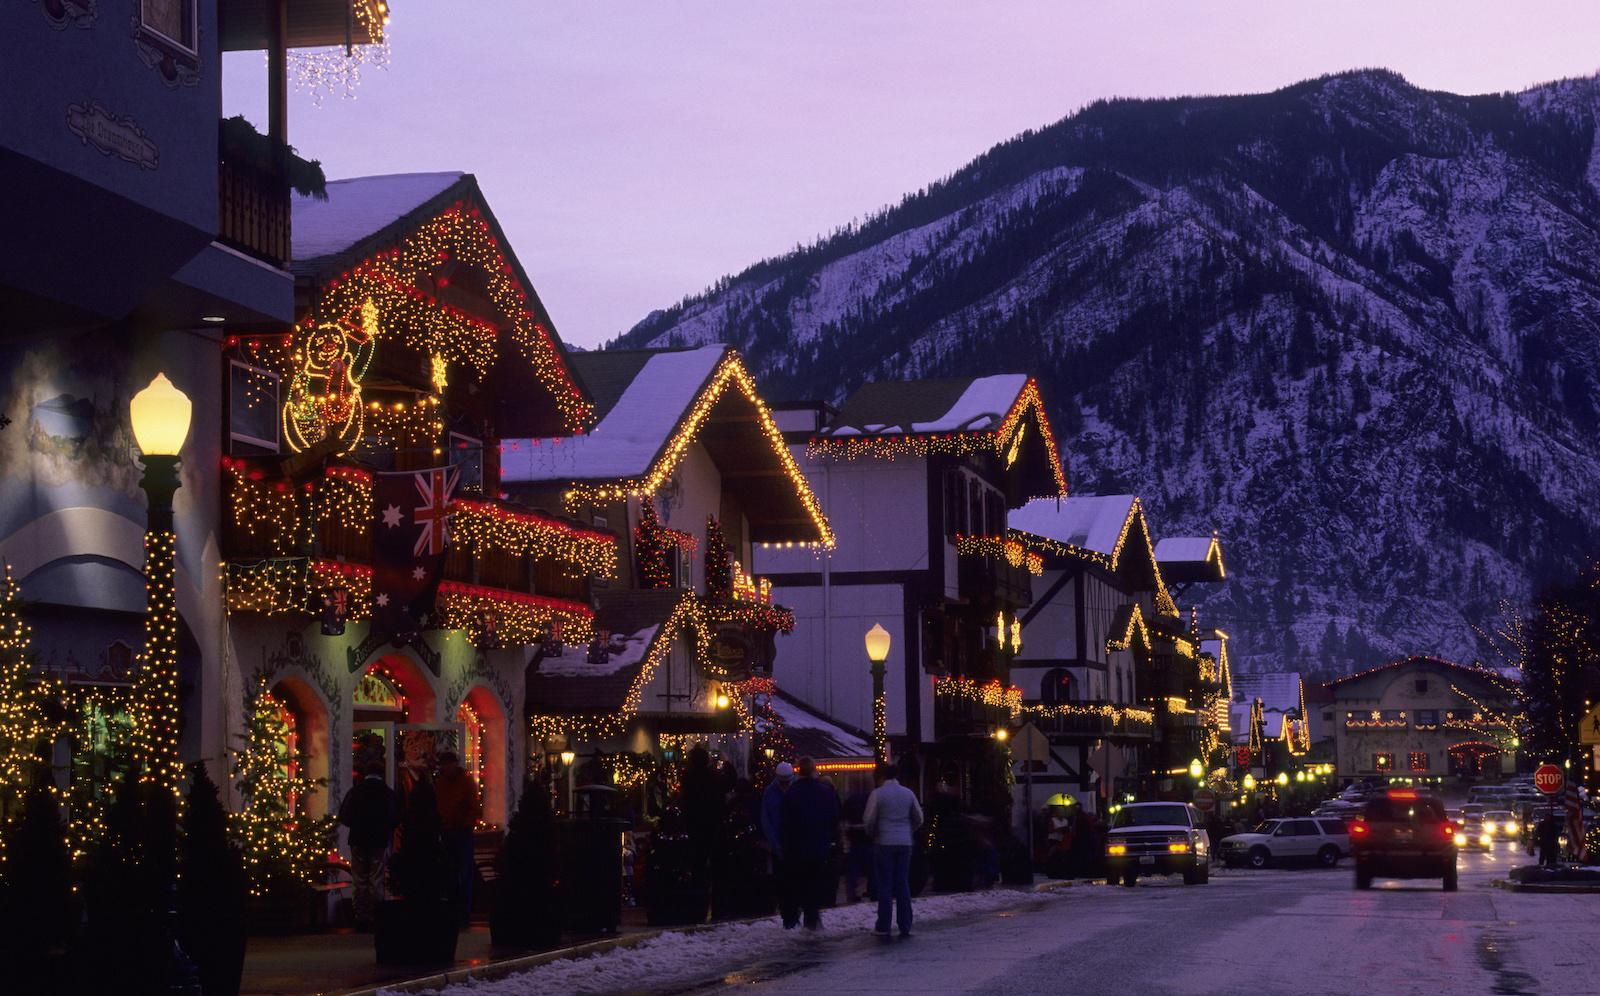 USA, Washington, Leavenworth In Winter, Street Scene With